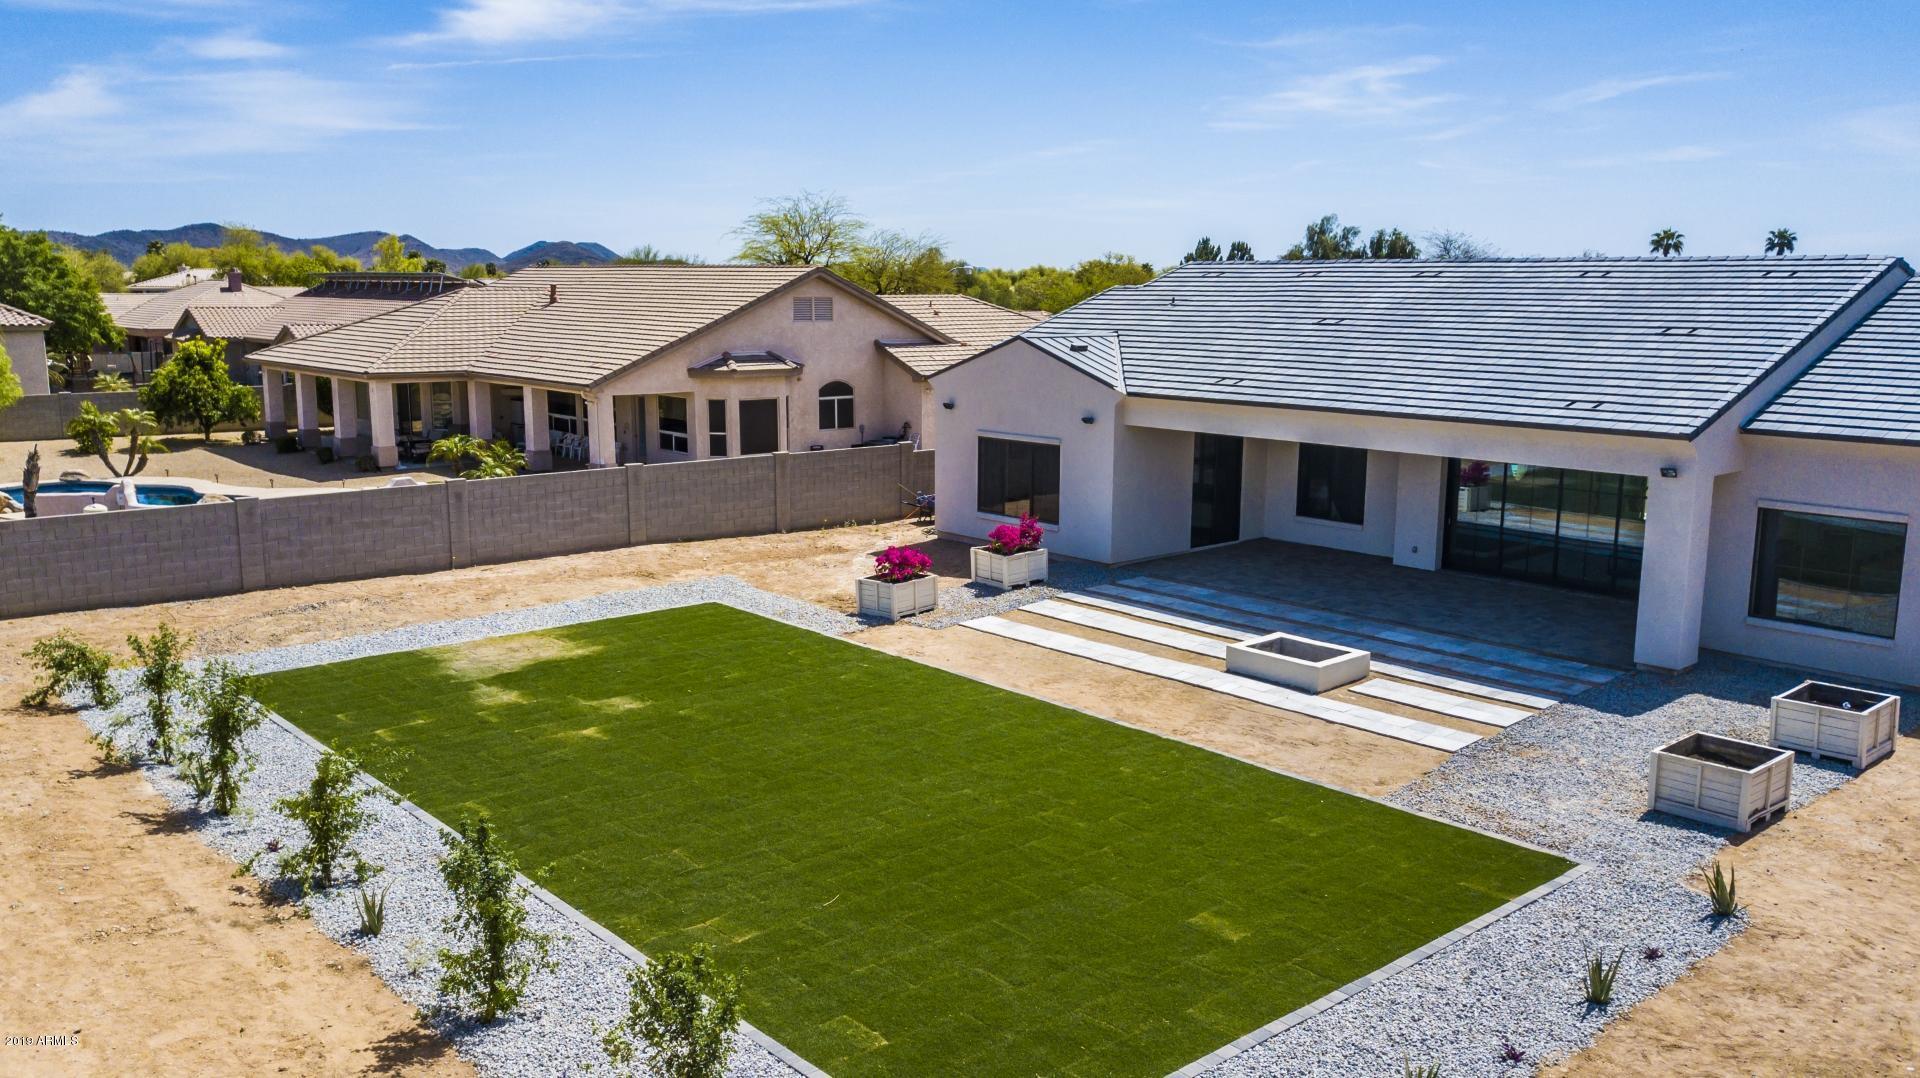 MLS 5906779 8140 W HATFIELD Road, Peoria, AZ 85383 Peoria AZ Newly Built